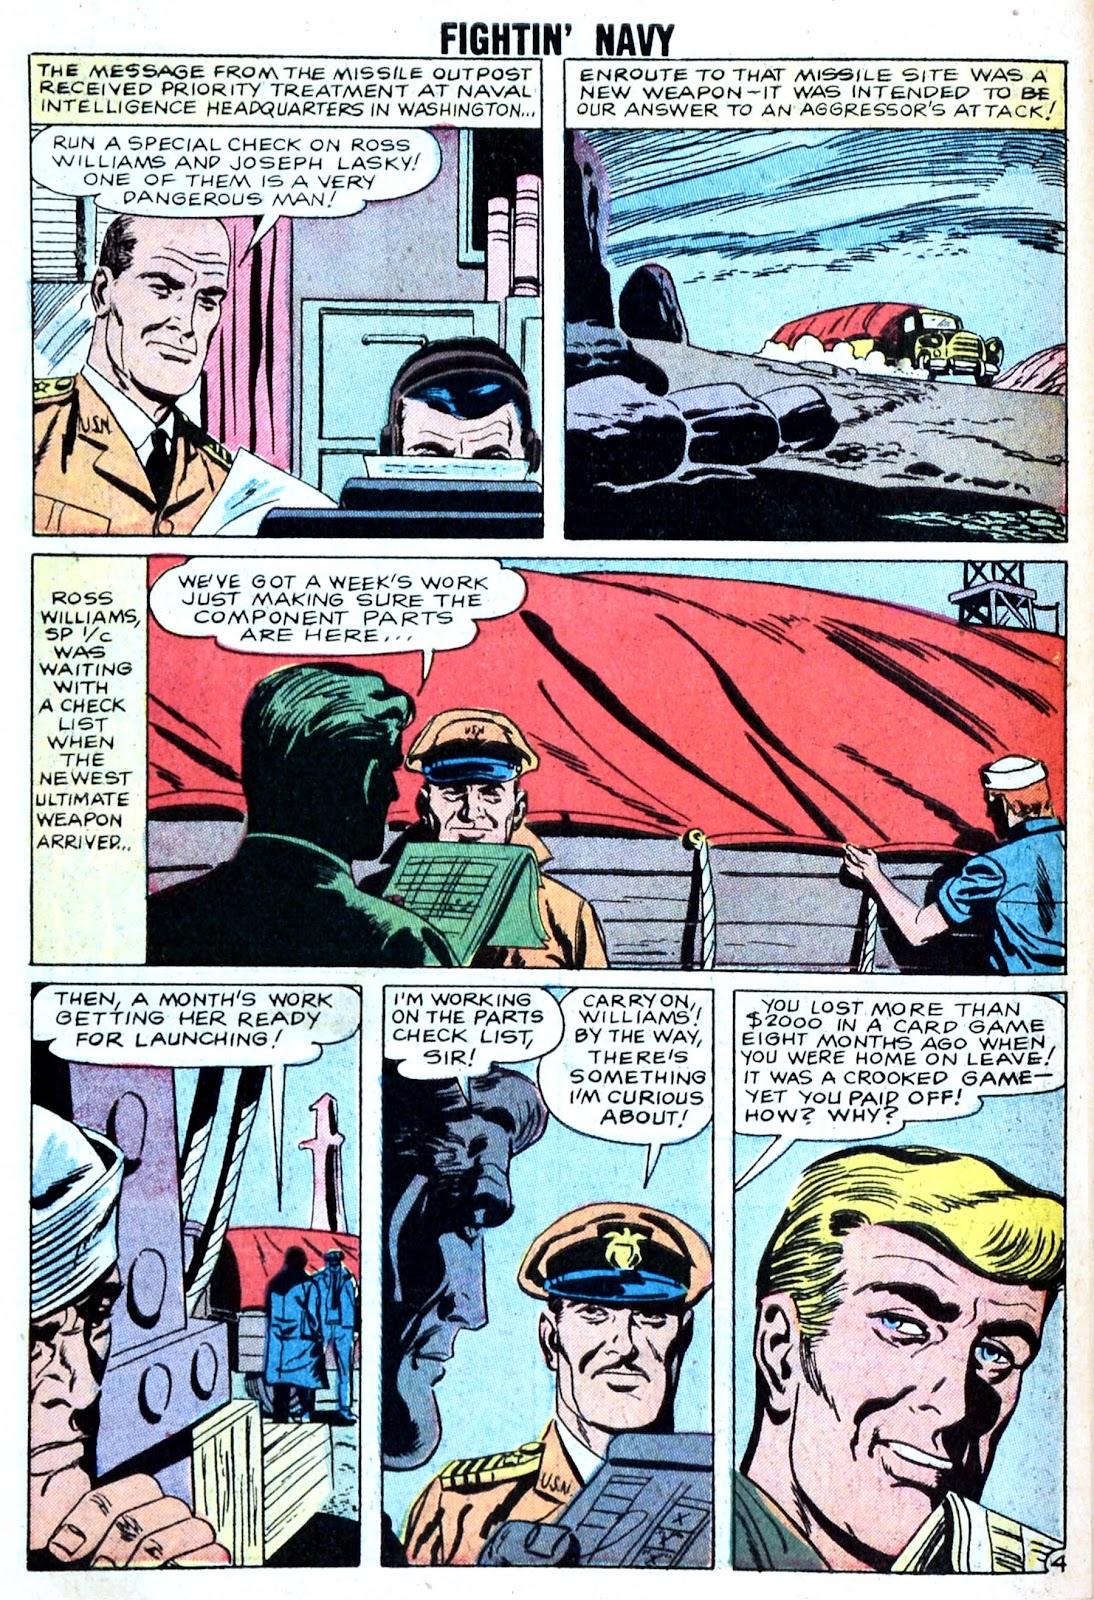 Read online Fightin' Navy comic -  Issue #85 - 30